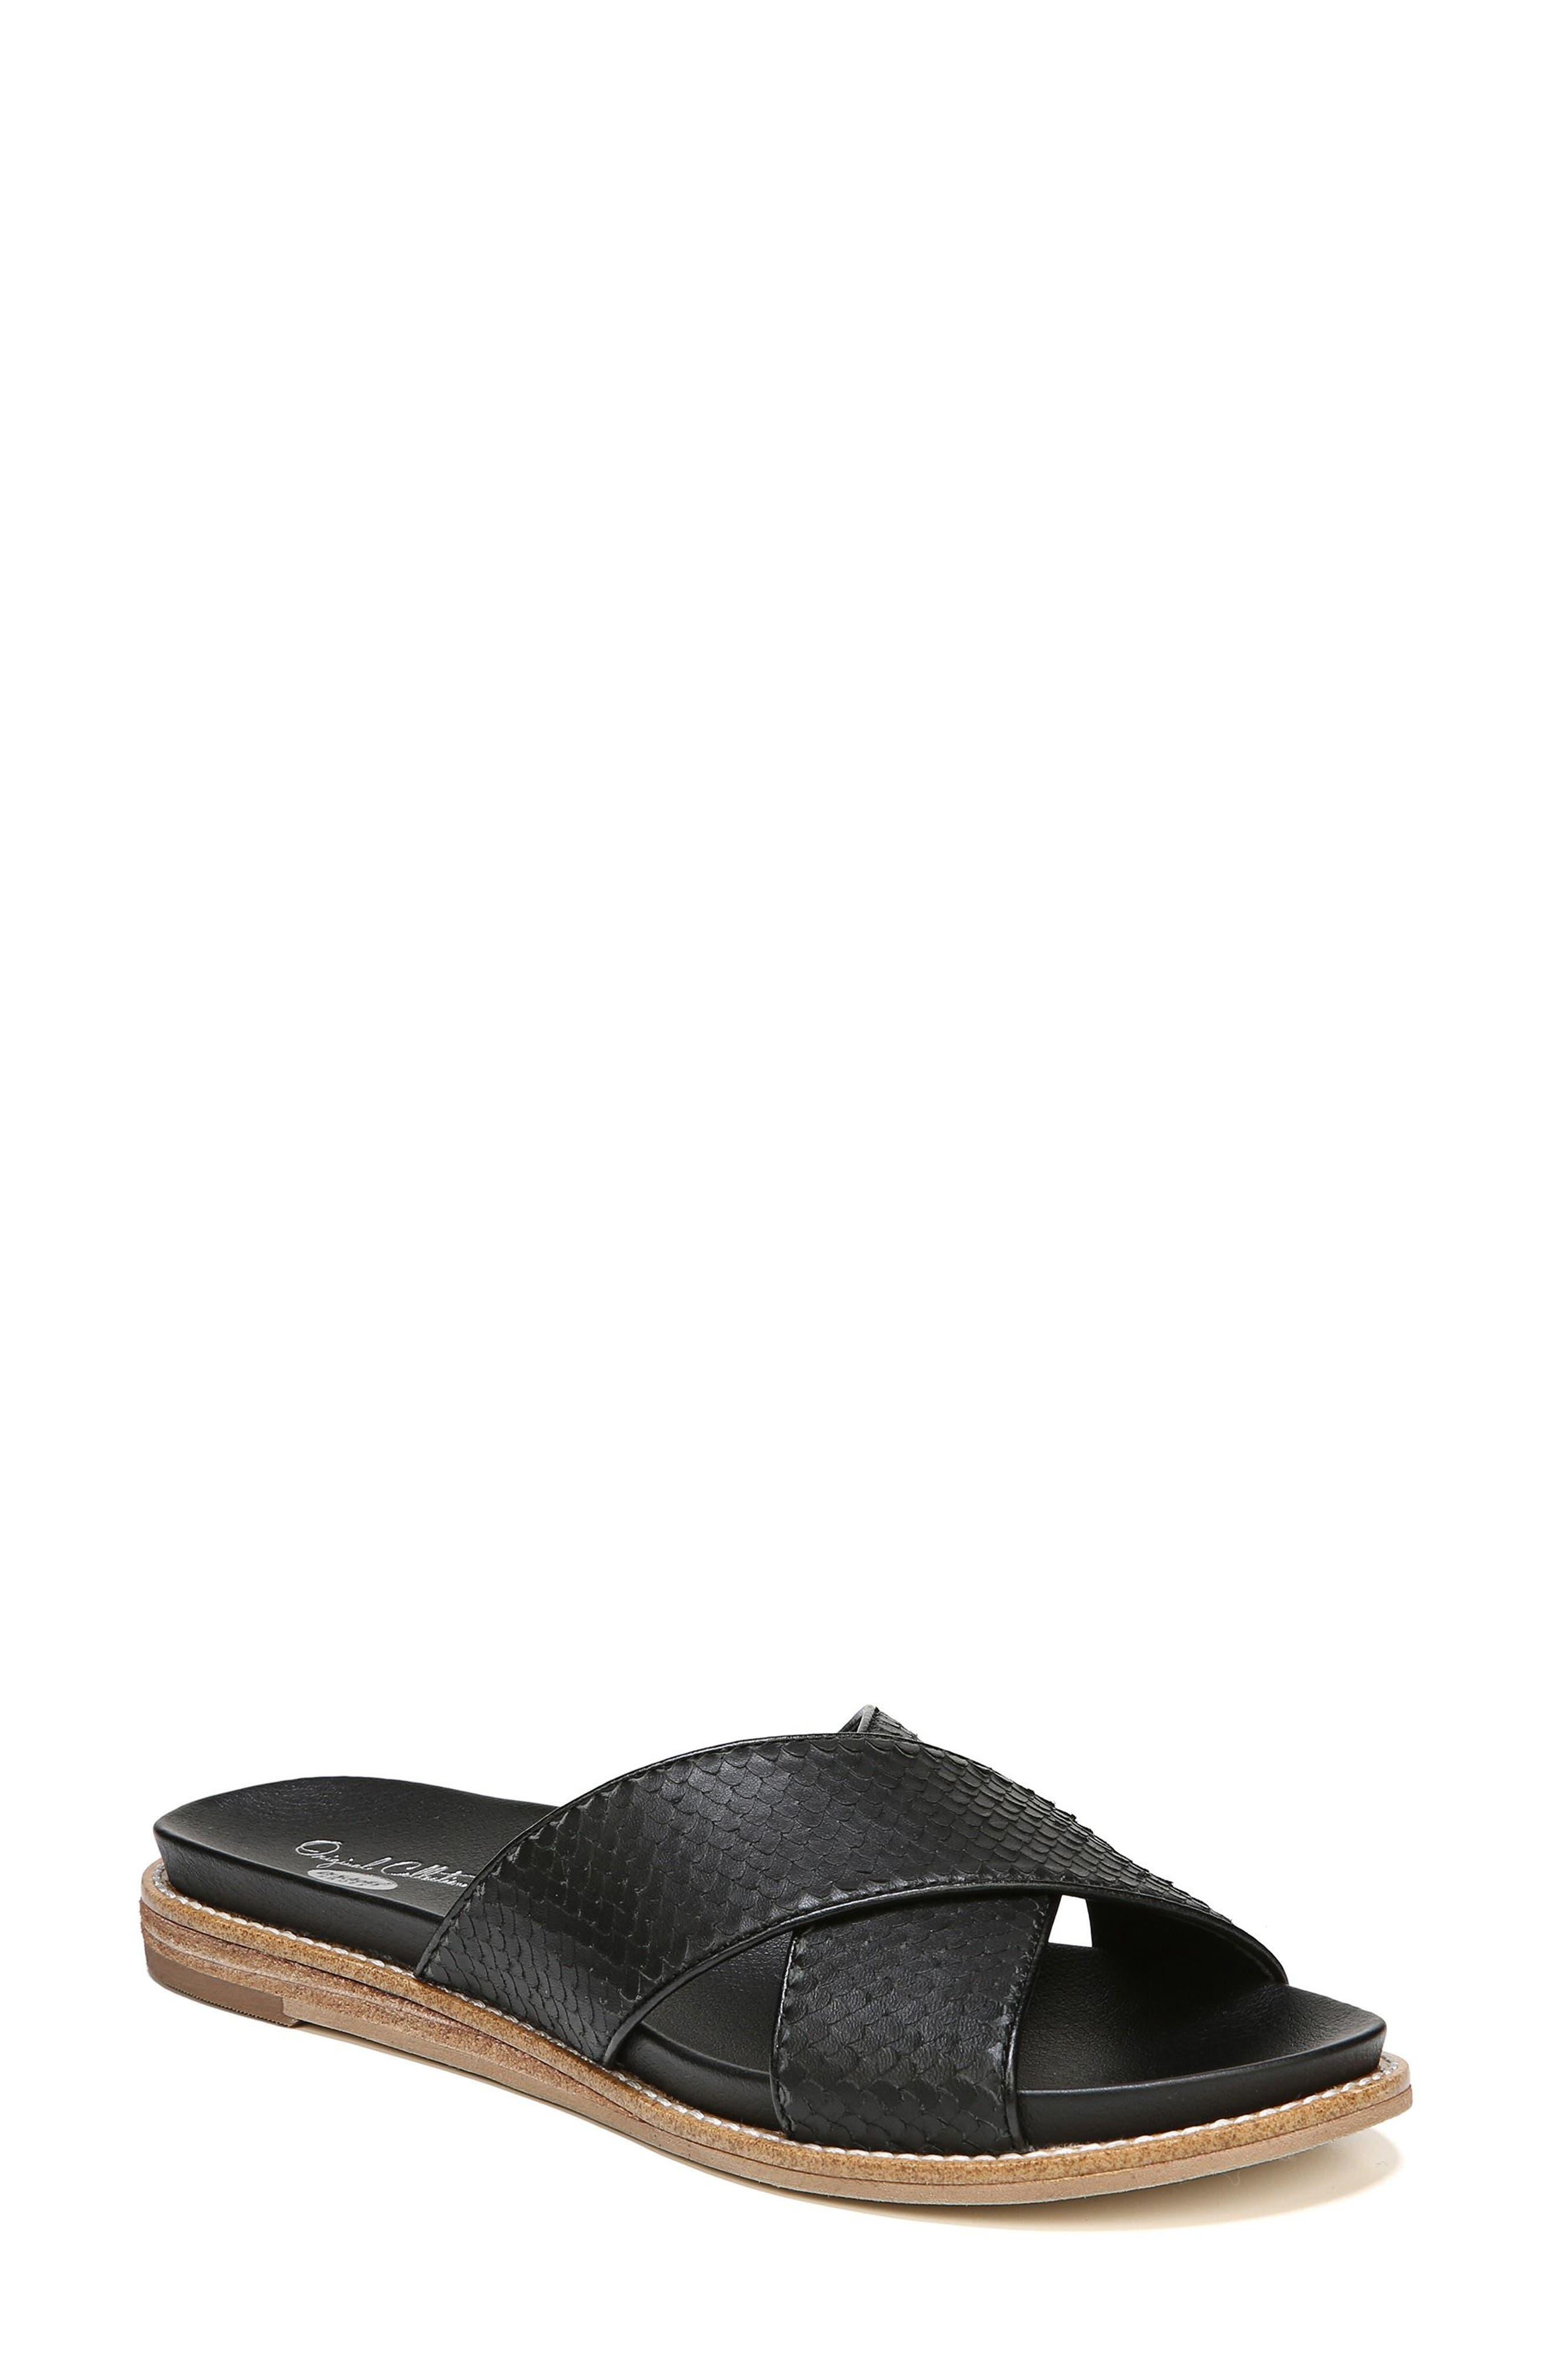 DR. SCHOLL'S Deco Slide Sandal, Main, color, BLACK LEATHER